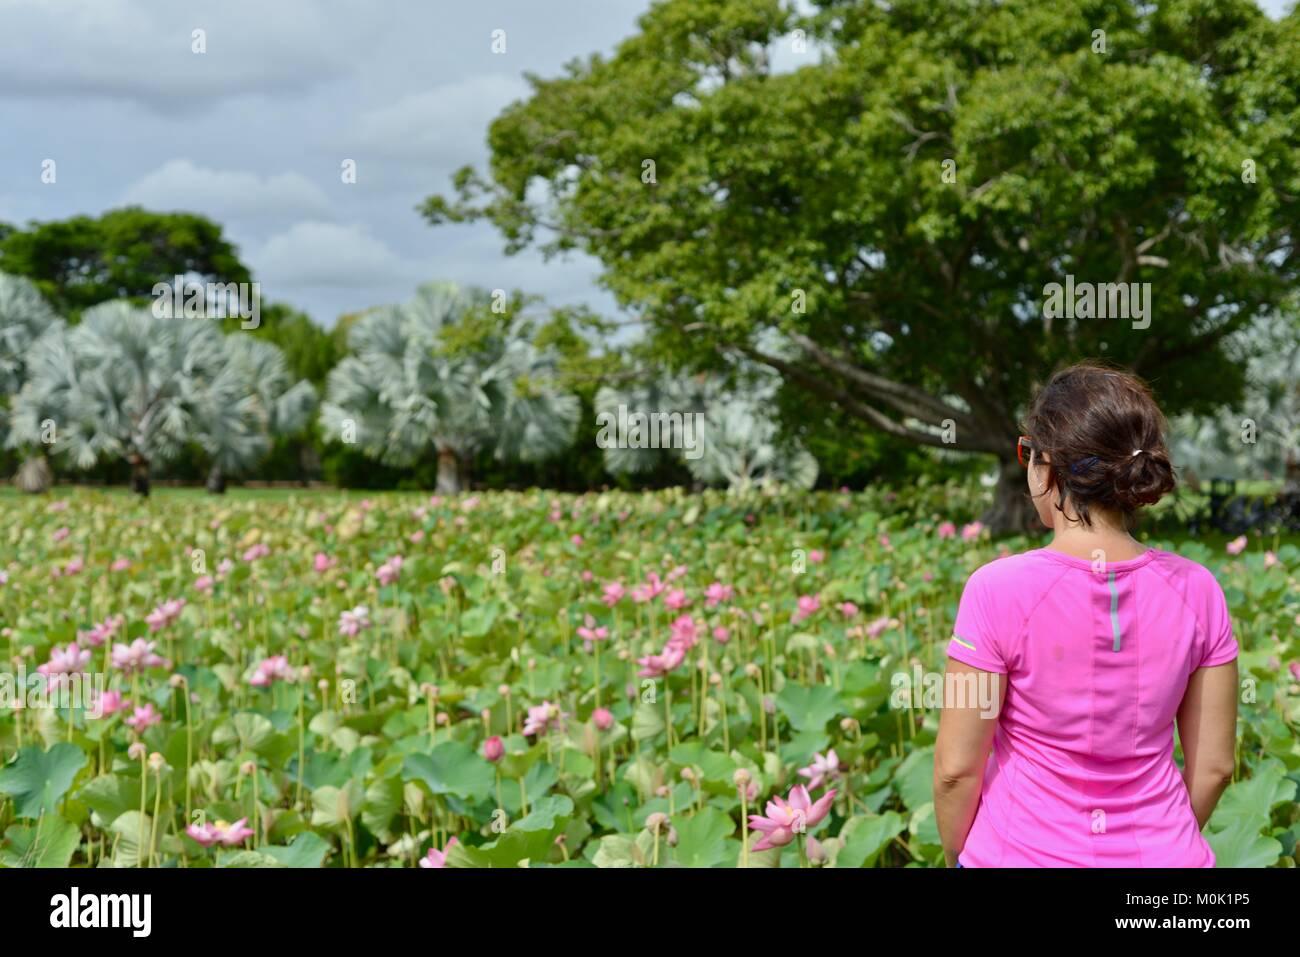 Women with pink sports top enjoying Anderson Park Botanic Gardens, Townsville, Queensland, Australia Stock Photo